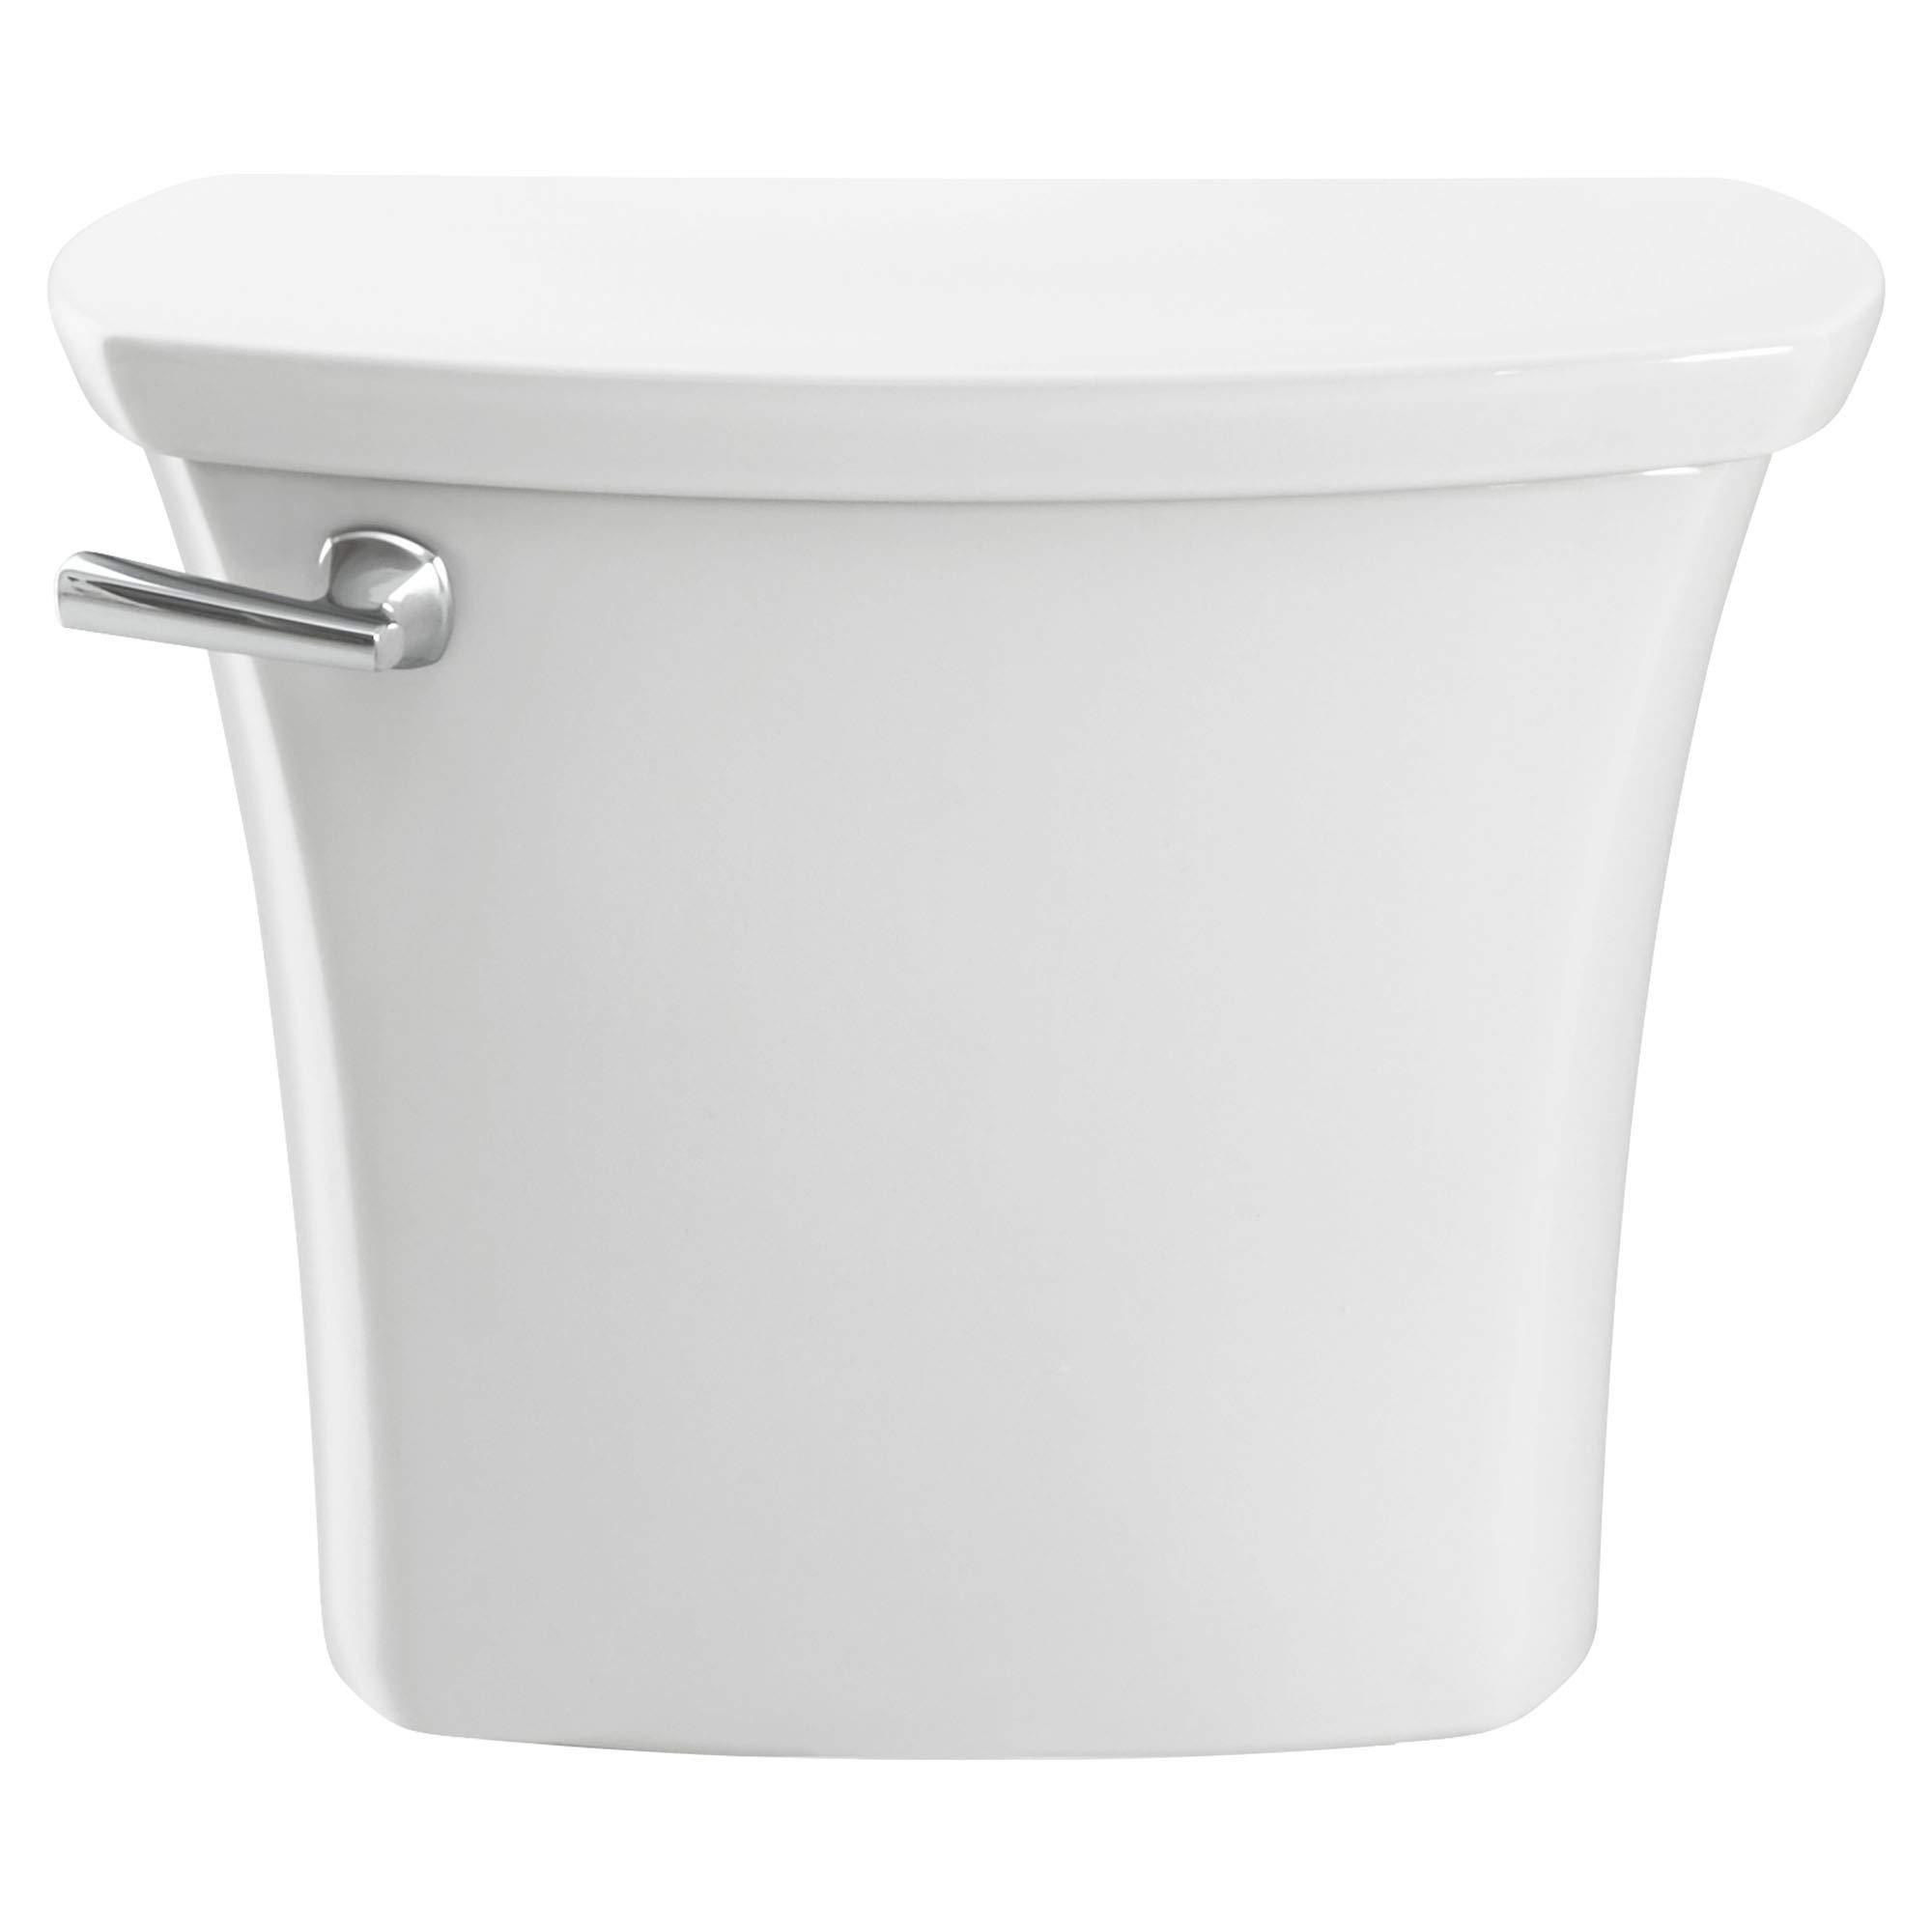 American Standard 4519B104.020 Edgemere Toilet Tank White